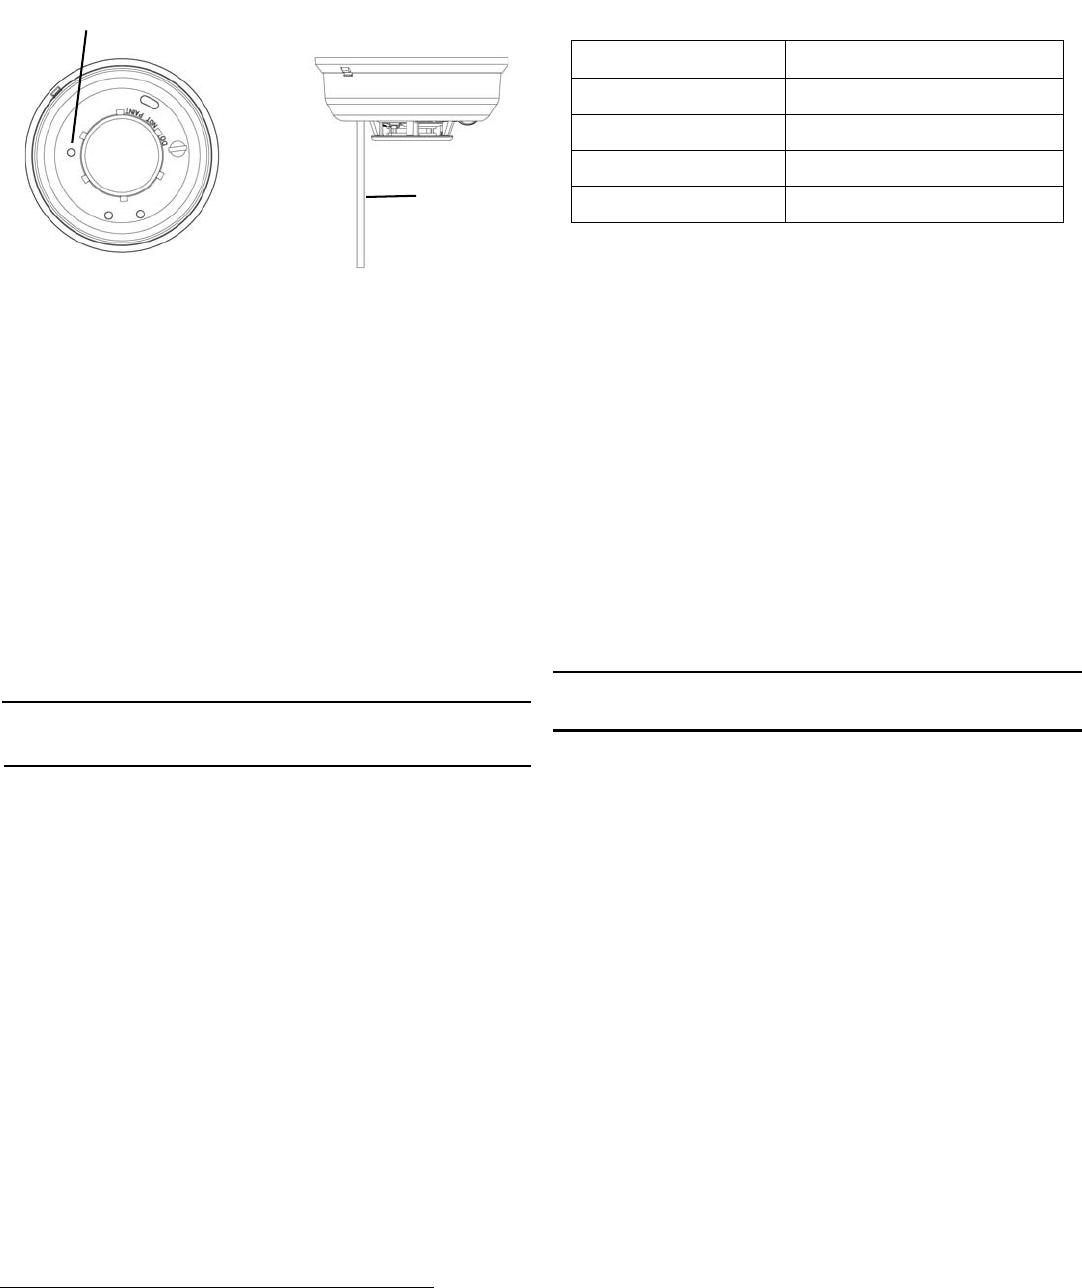 Inovonics Wiring Diagram on lighting diagrams, switch diagrams, led circuit diagrams, battery diagrams, friendship bracelet diagrams, motor diagrams, engine diagrams, transformer diagrams, troubleshooting diagrams, pinout diagrams, sincgars radio configurations diagrams, electrical diagrams, gmc fuse box diagrams, smart car diagrams, internet of things diagrams, hvac diagrams, electronic circuit diagrams, honda motorcycle repair diagrams, series and parallel circuits diagrams, snatch block diagrams,